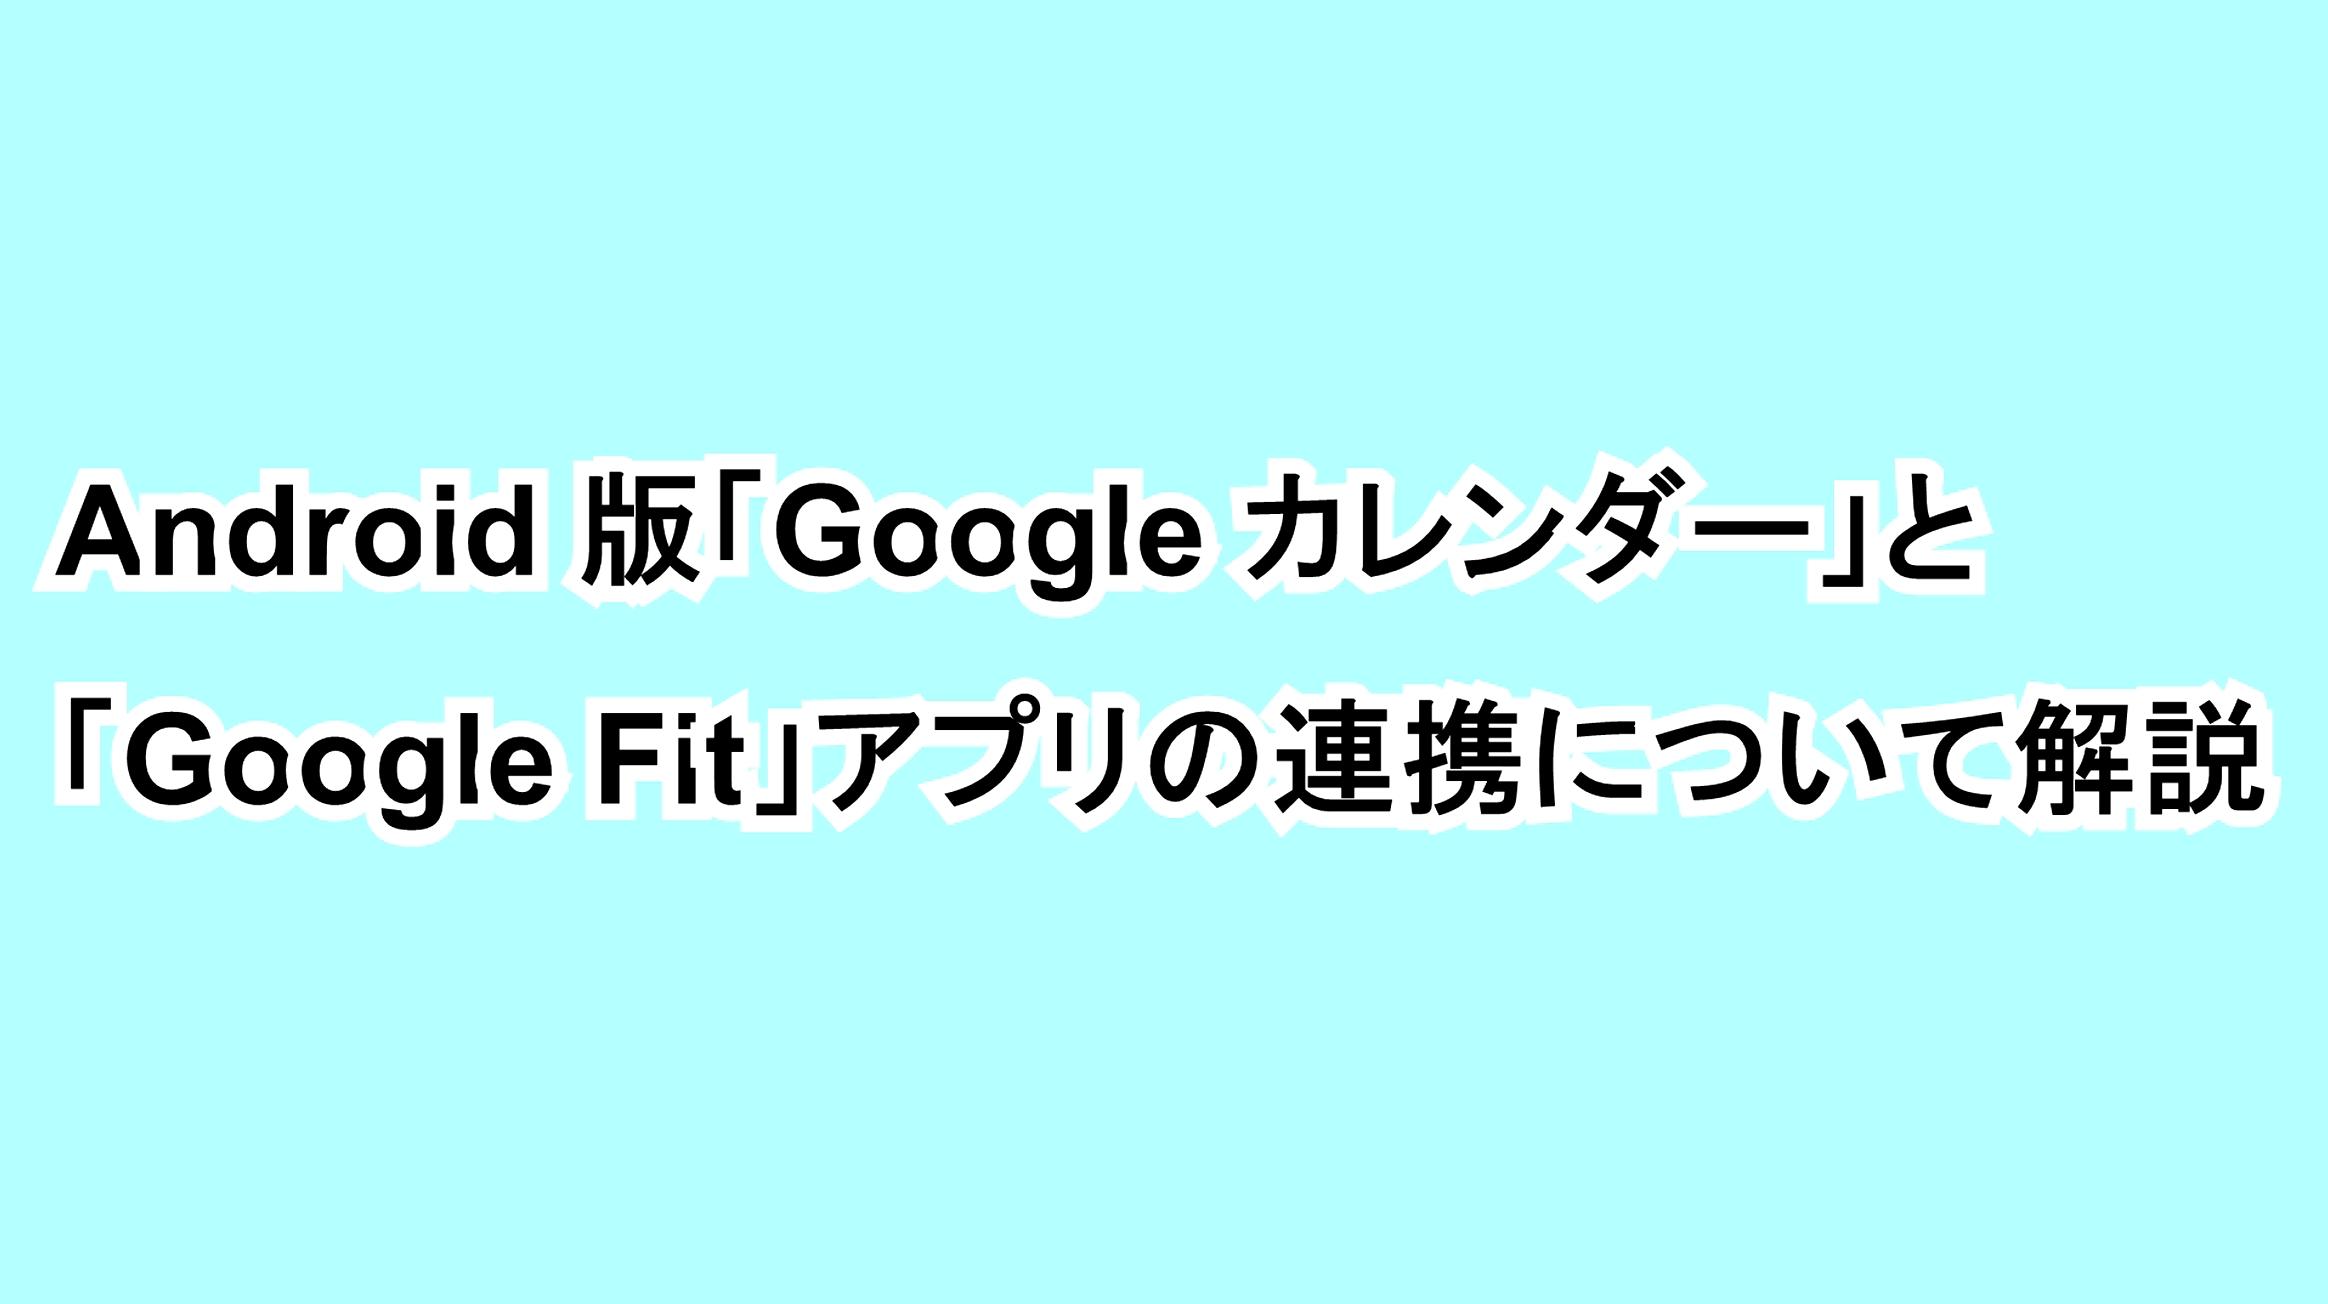 Android版「Google カレンダー」と「Google Fit」アプリの連携について解説